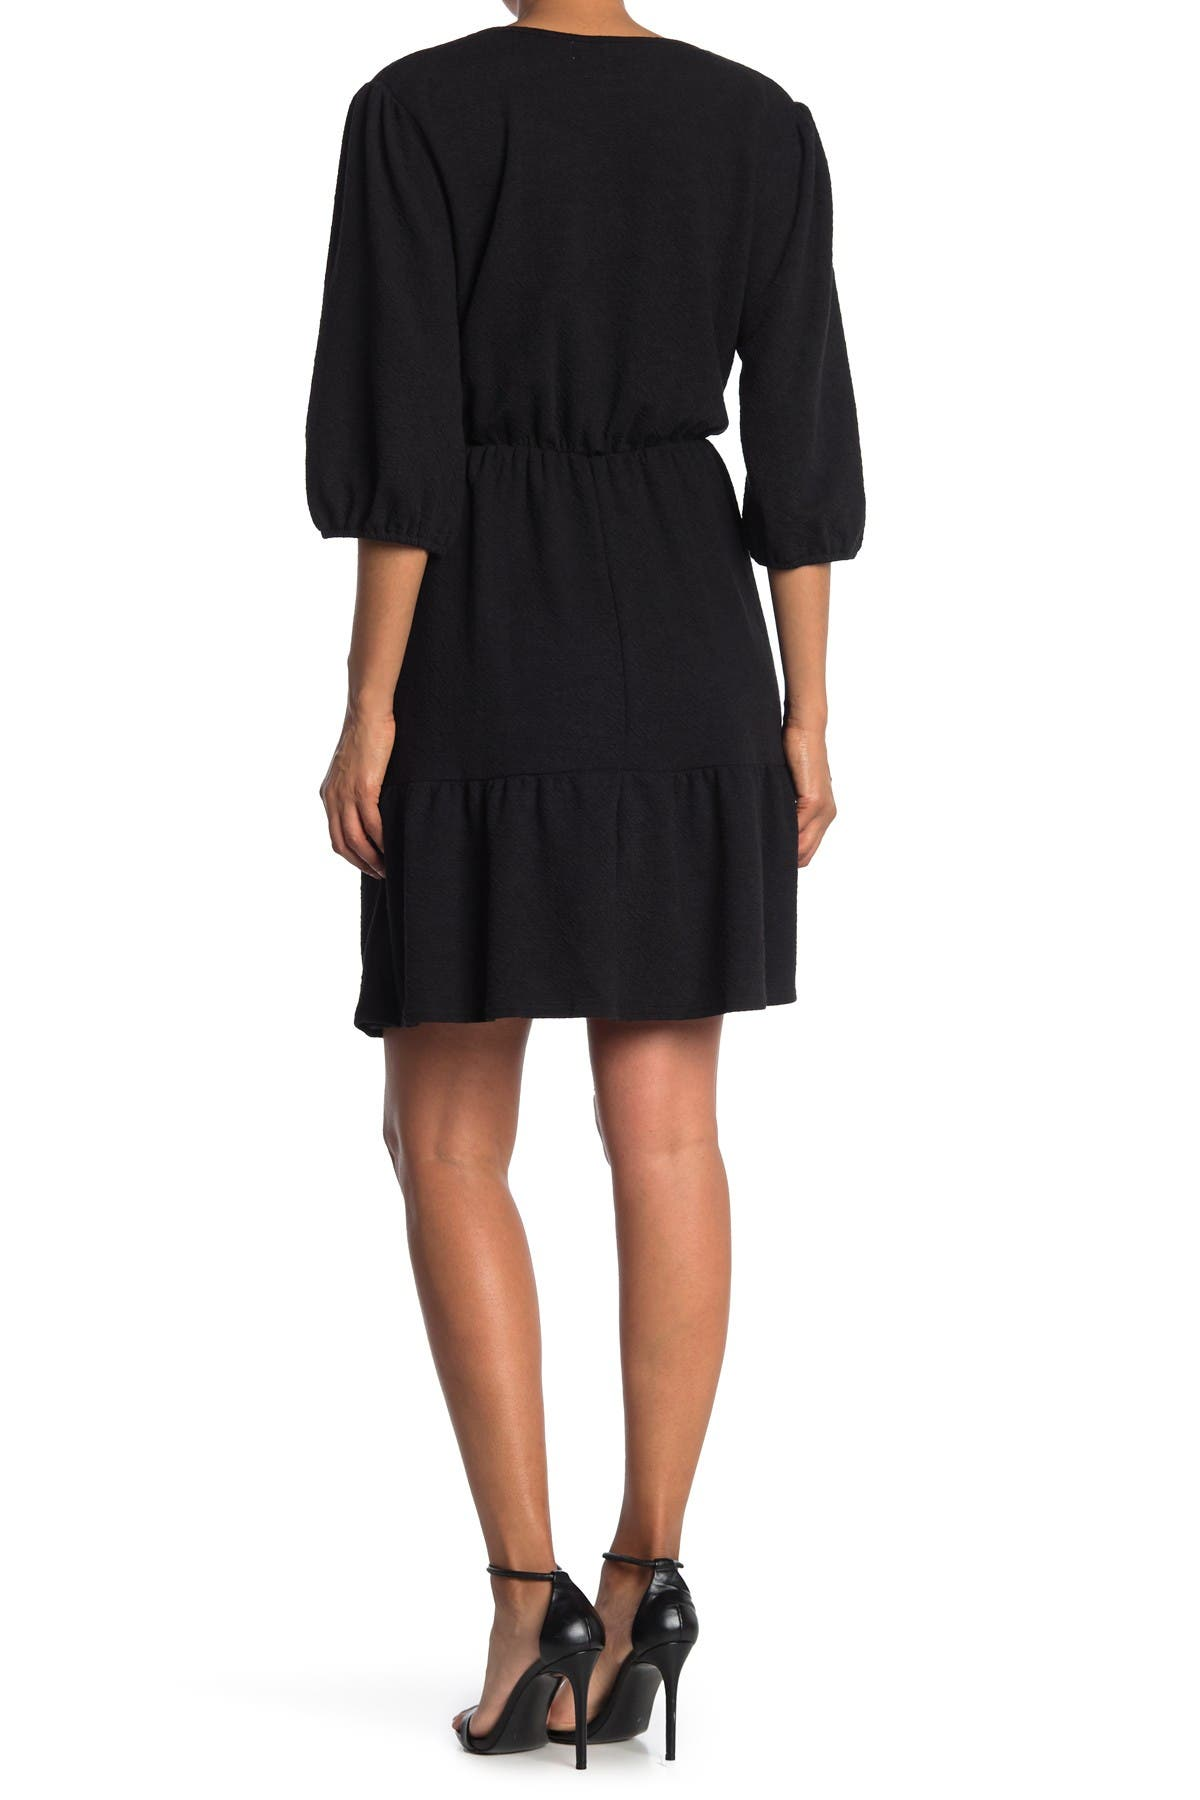 Image of MELLODAY Faux Wrap Tiered Hem Mini Dress